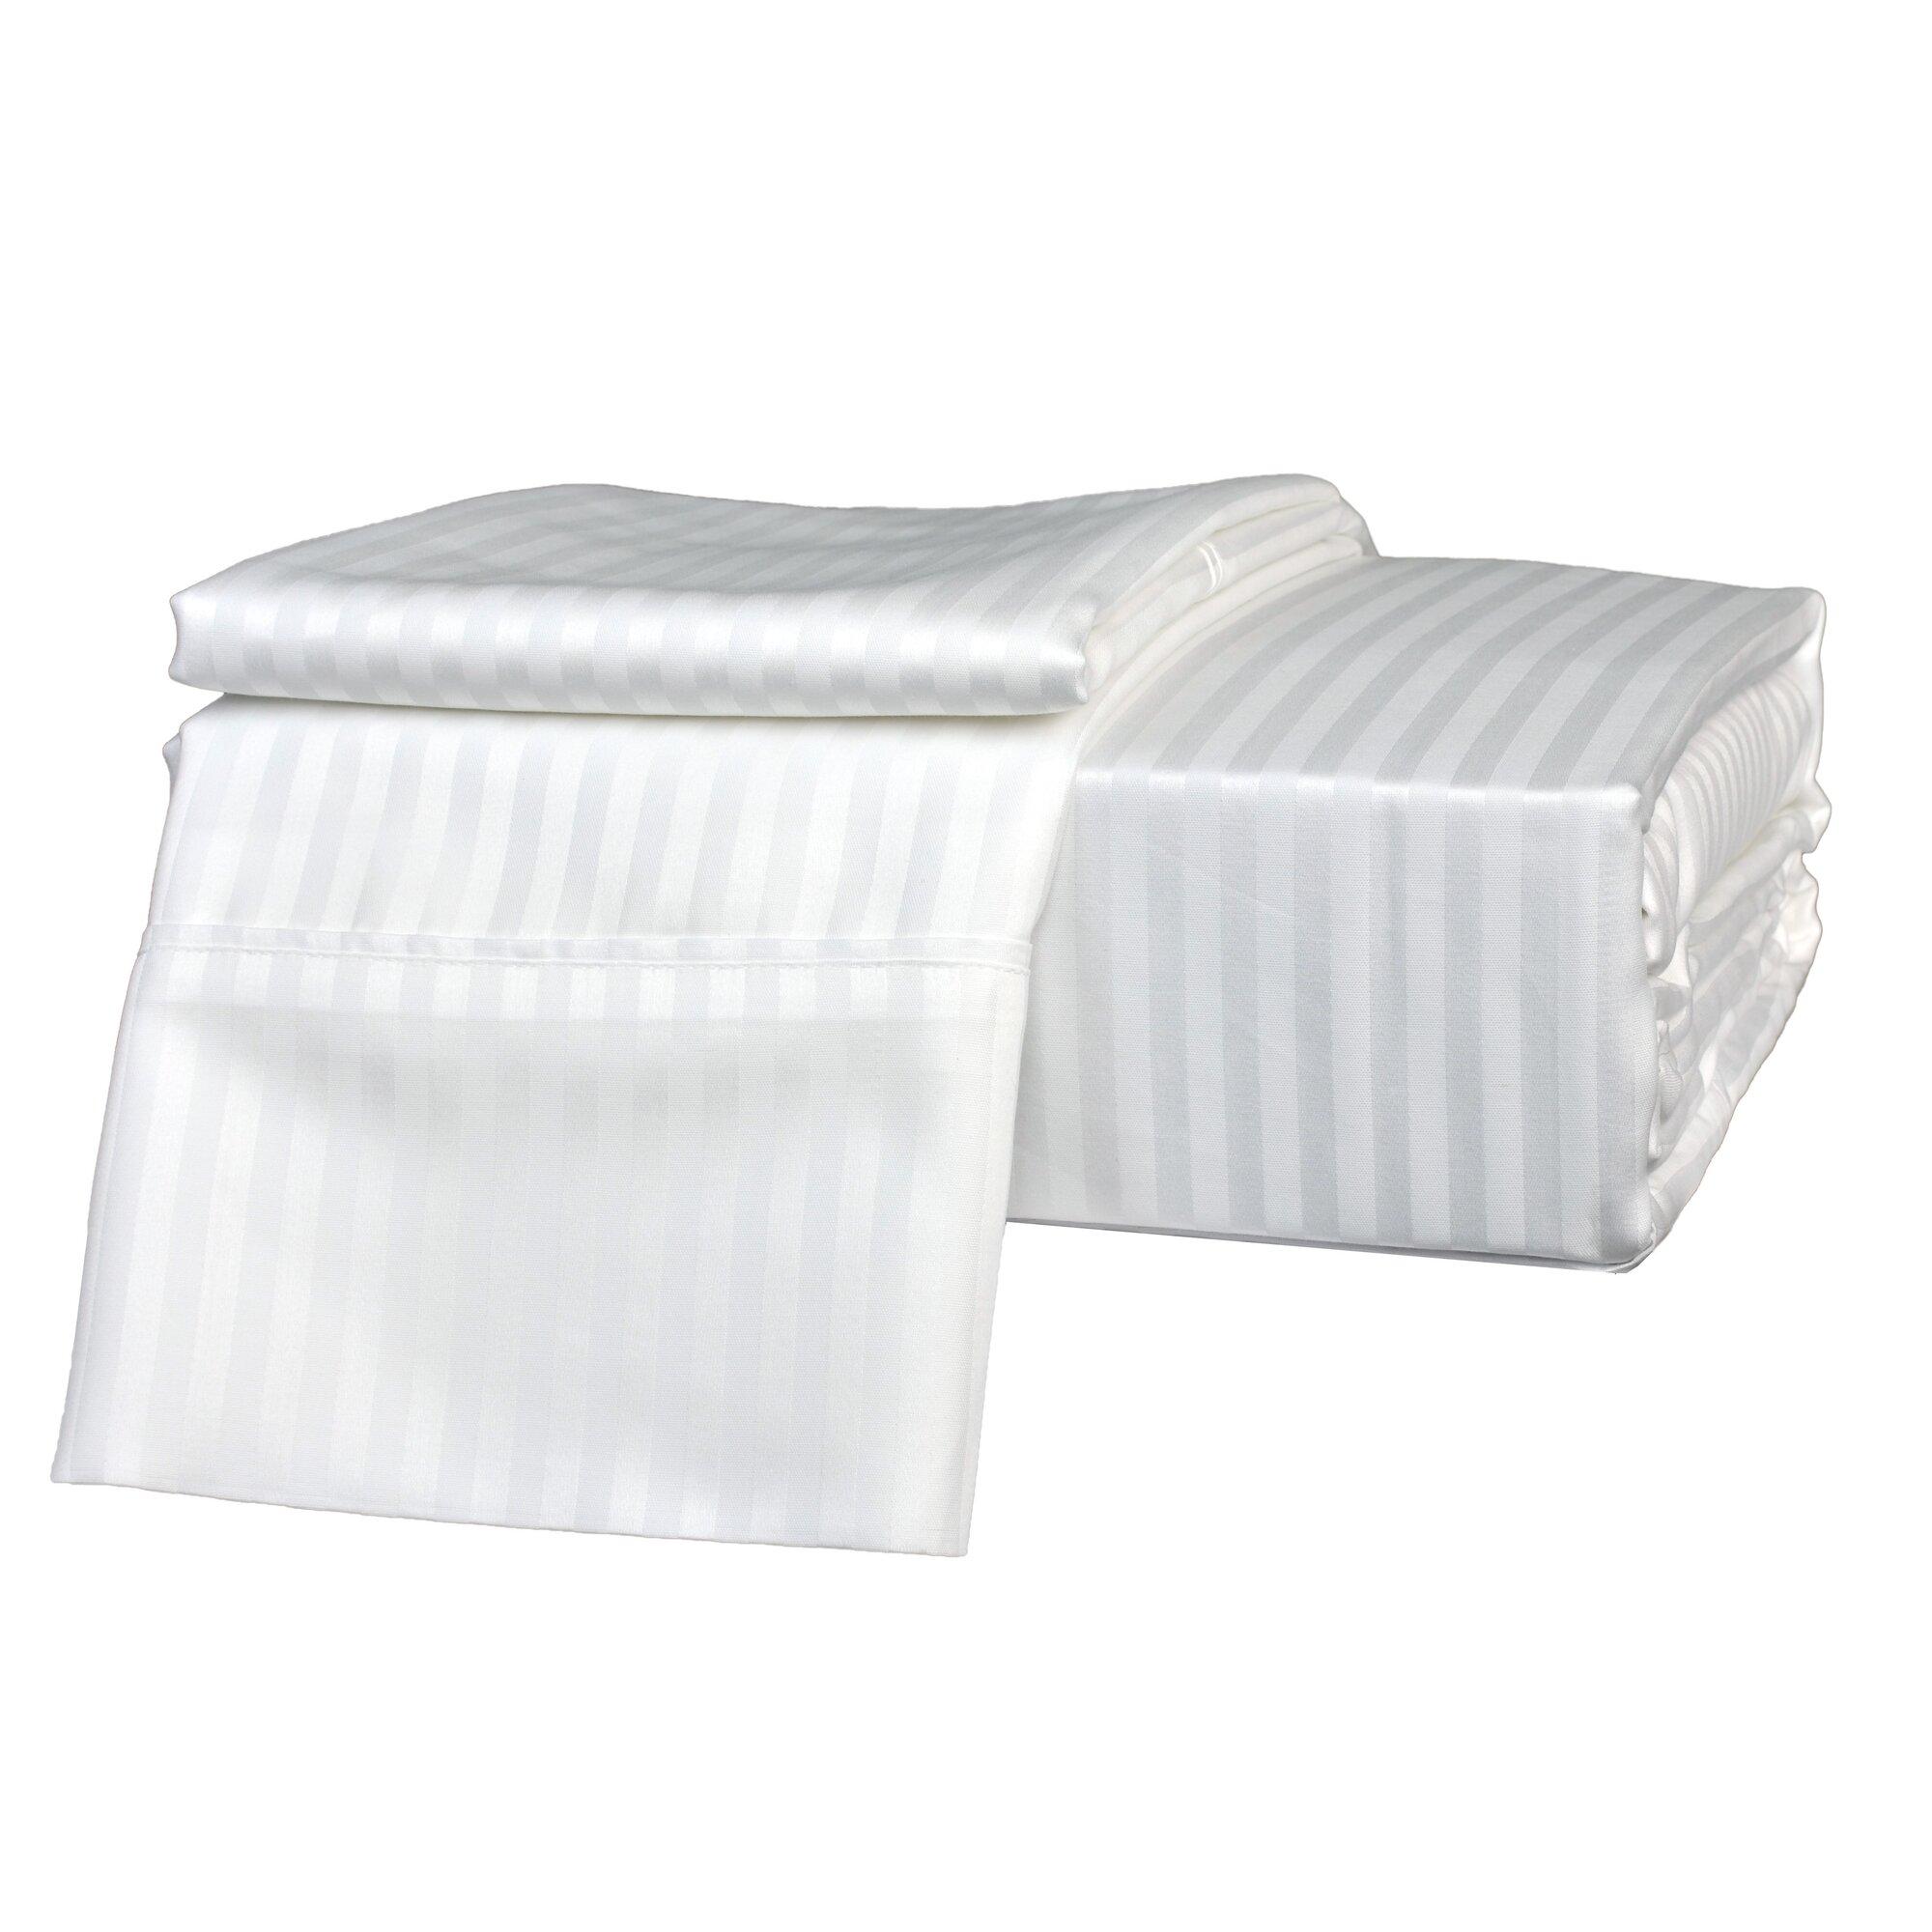 600 plus thread count egyptian quality cotton sateen premium sheet set reviews allmodern. Black Bedroom Furniture Sets. Home Design Ideas